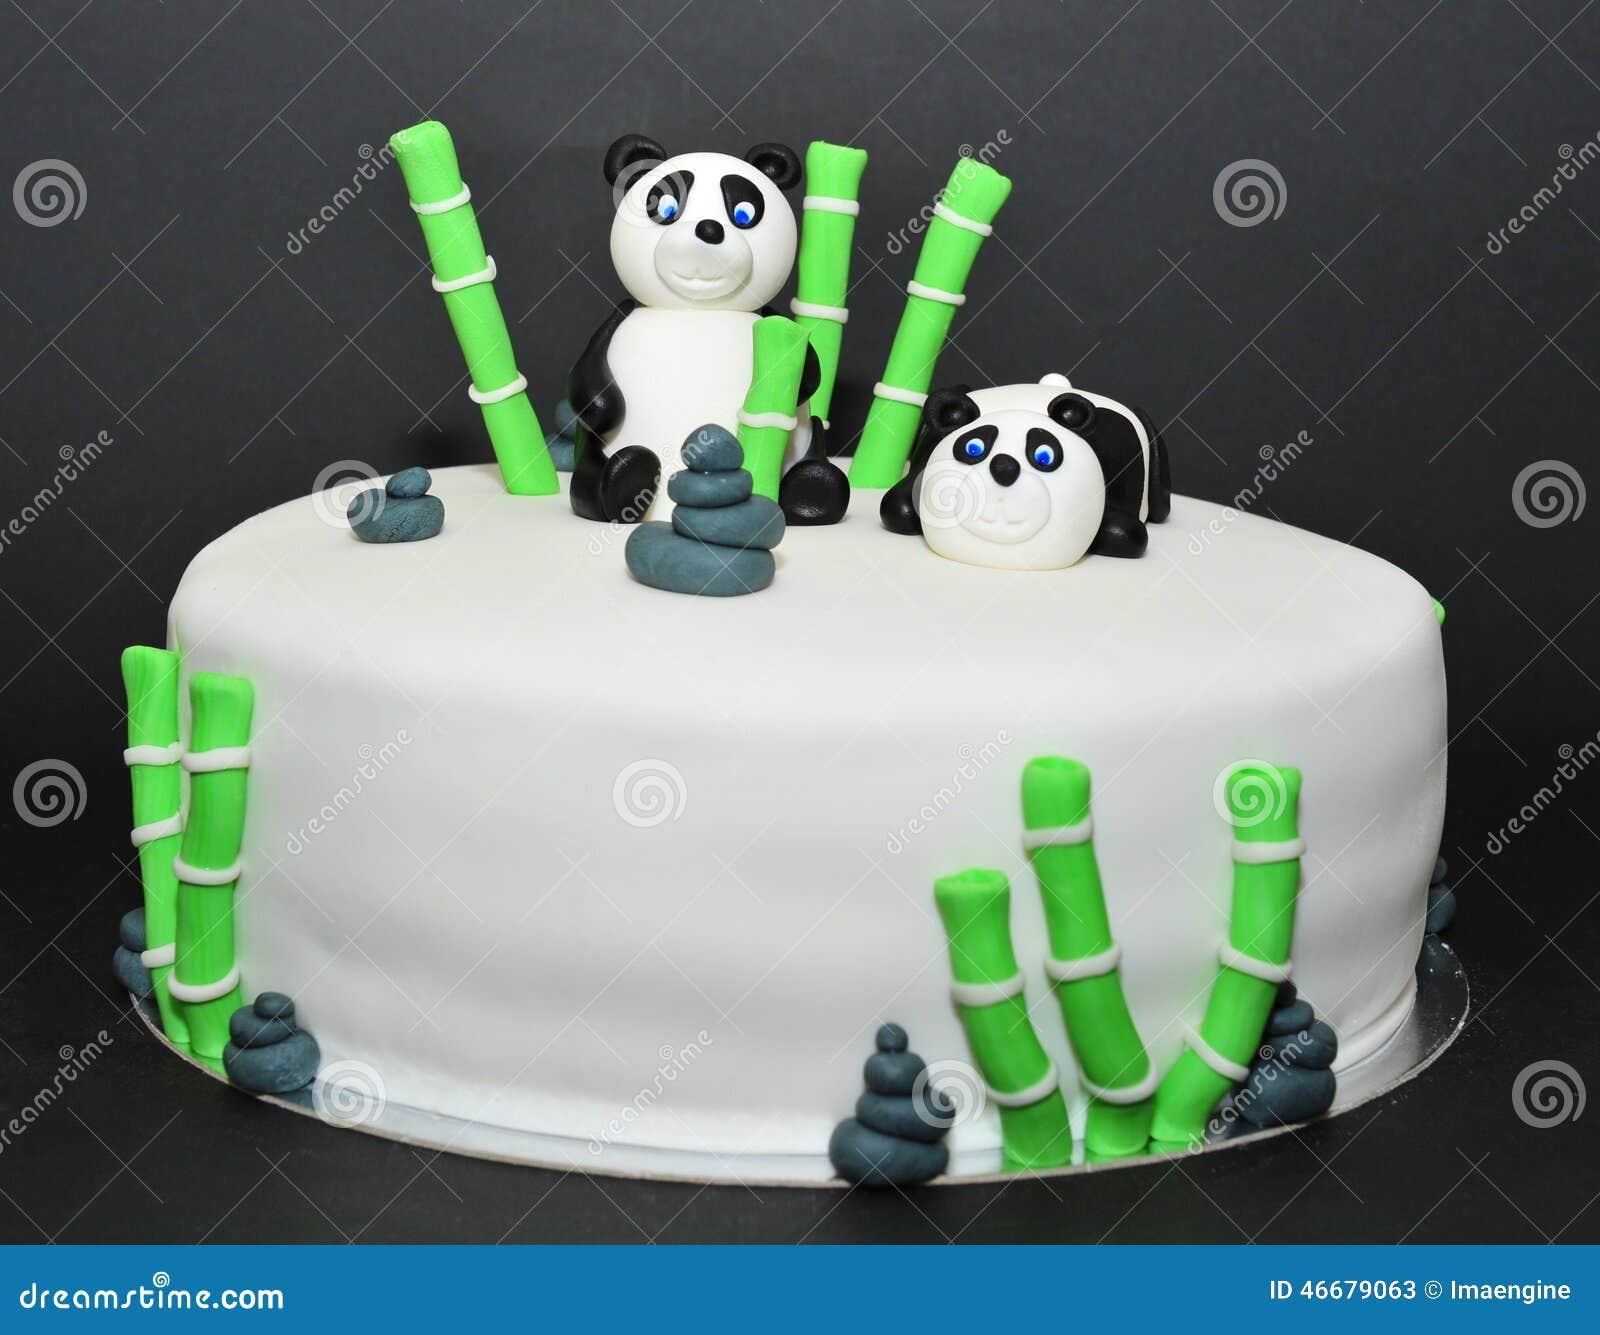 Koala Cake Ideas